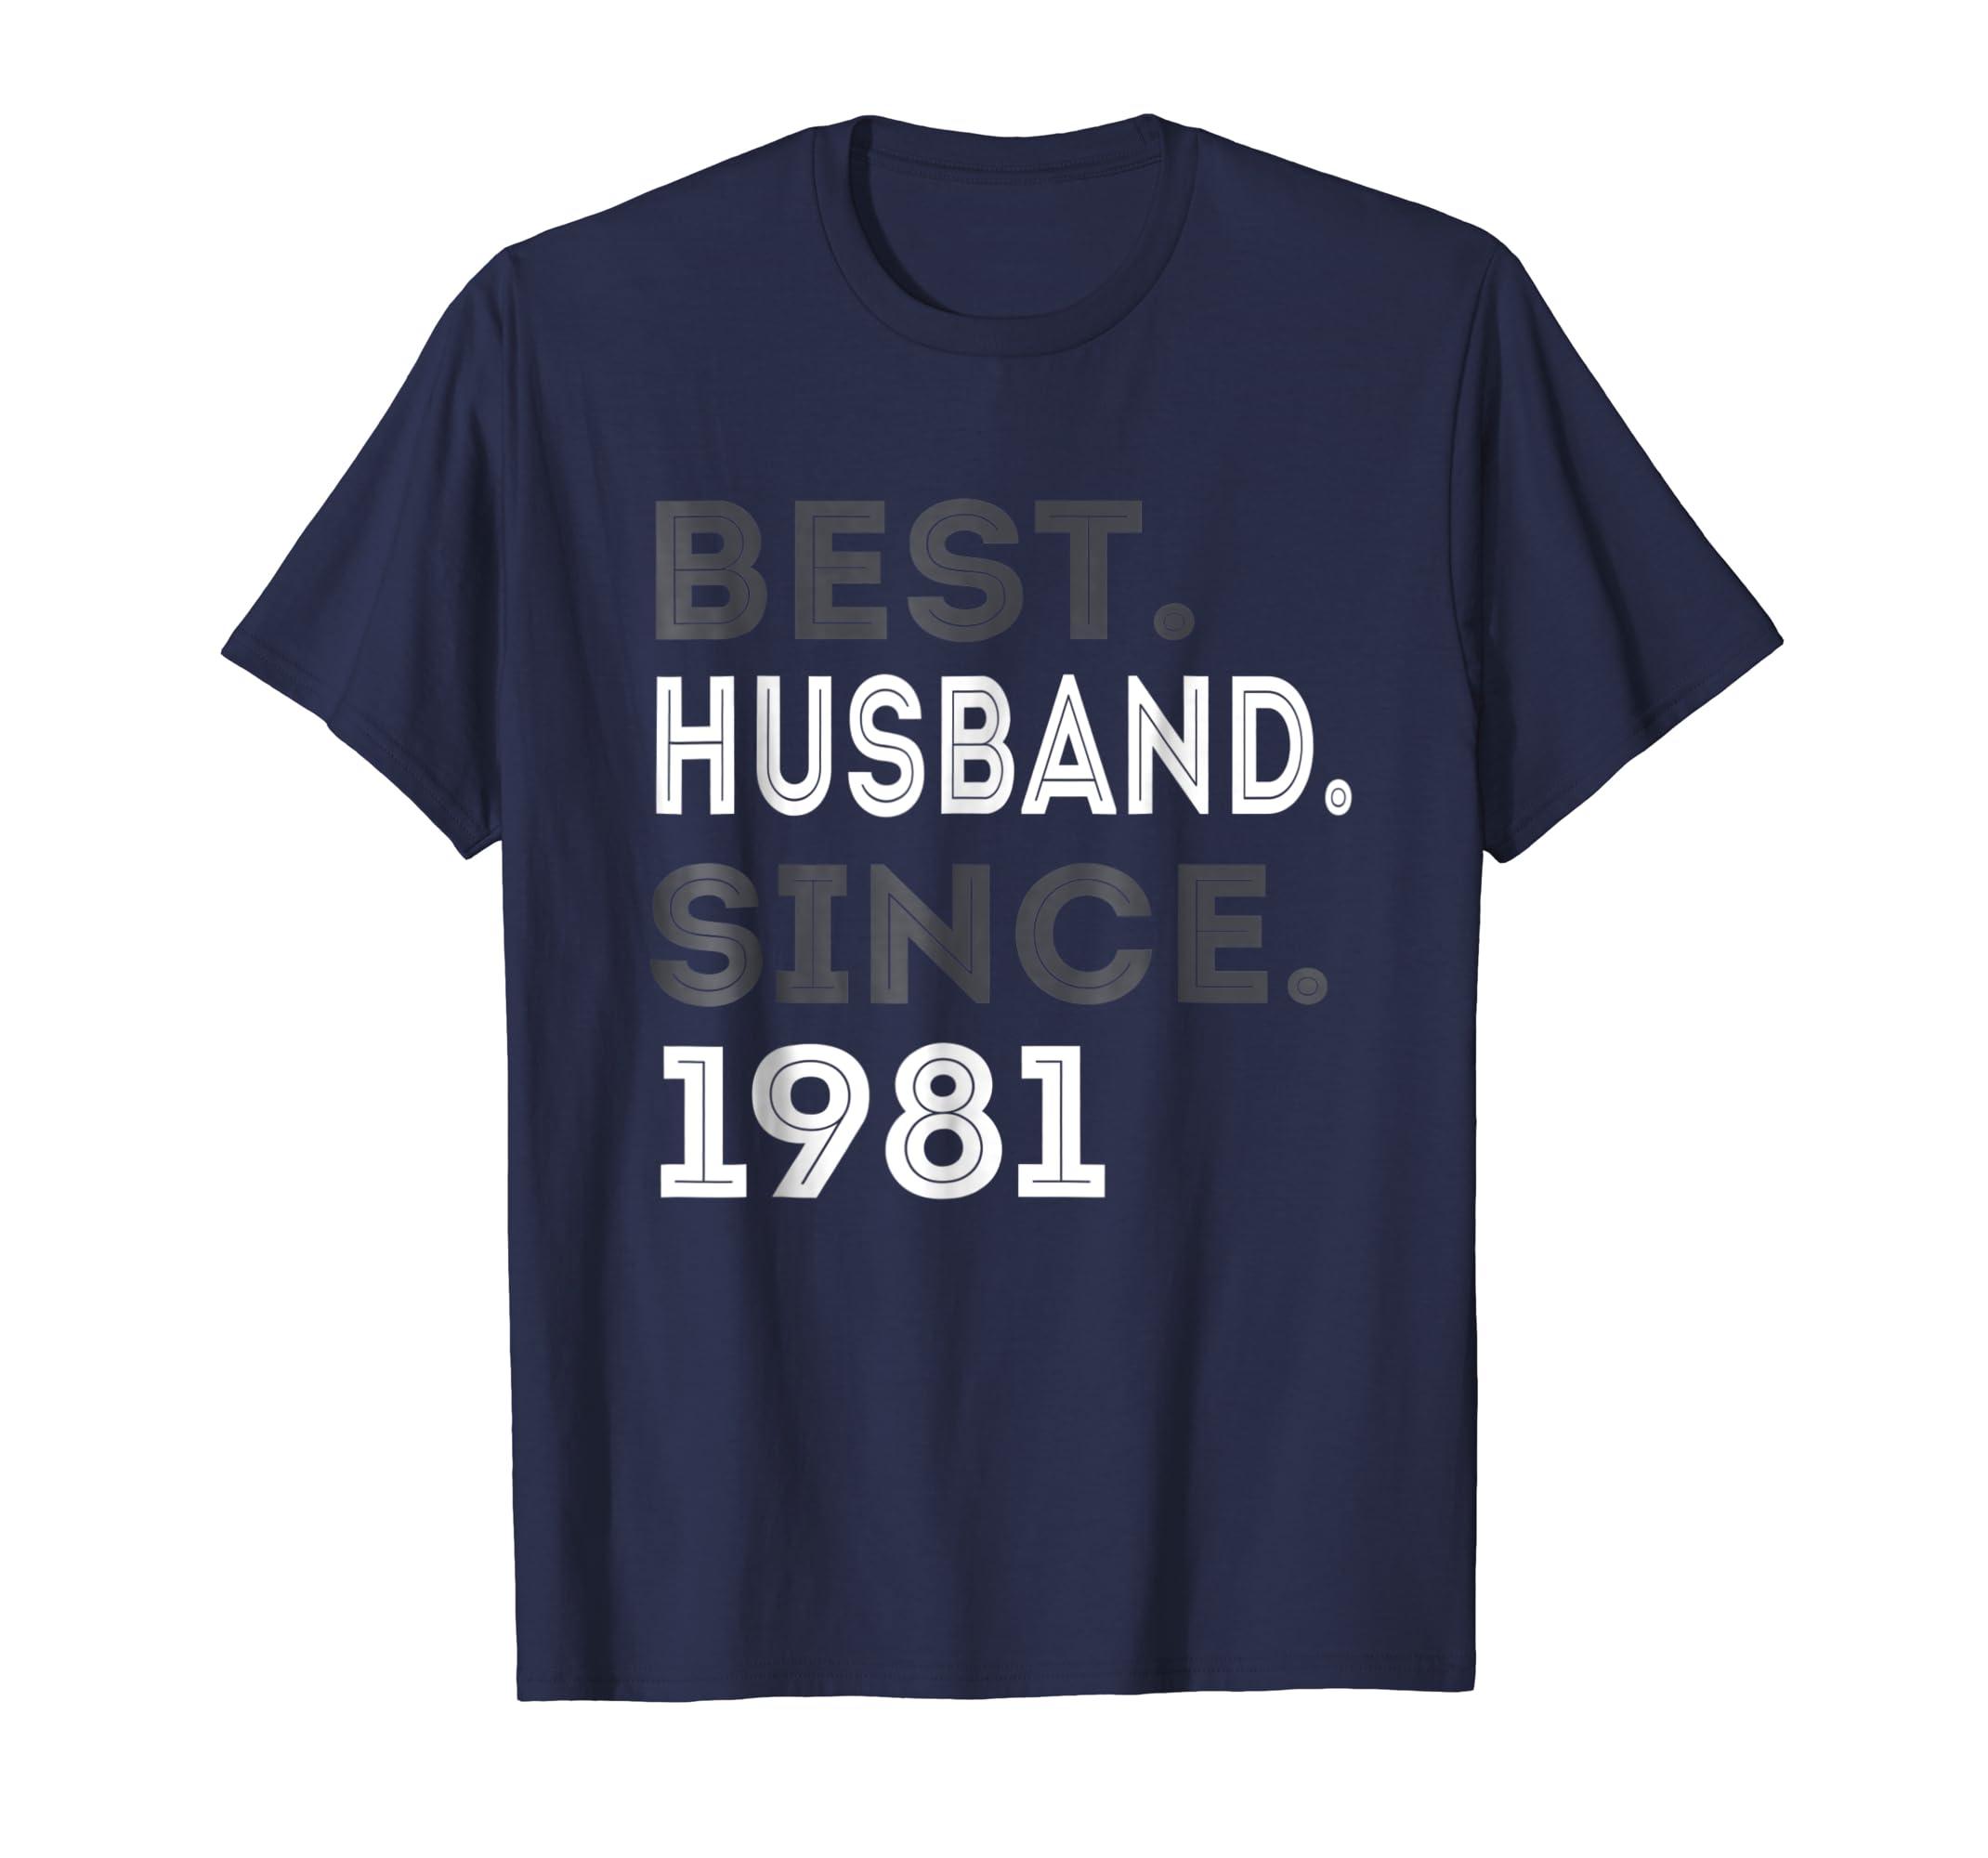 Best Husband Since 1981 38th Wedding Anniversary Gift-azvn